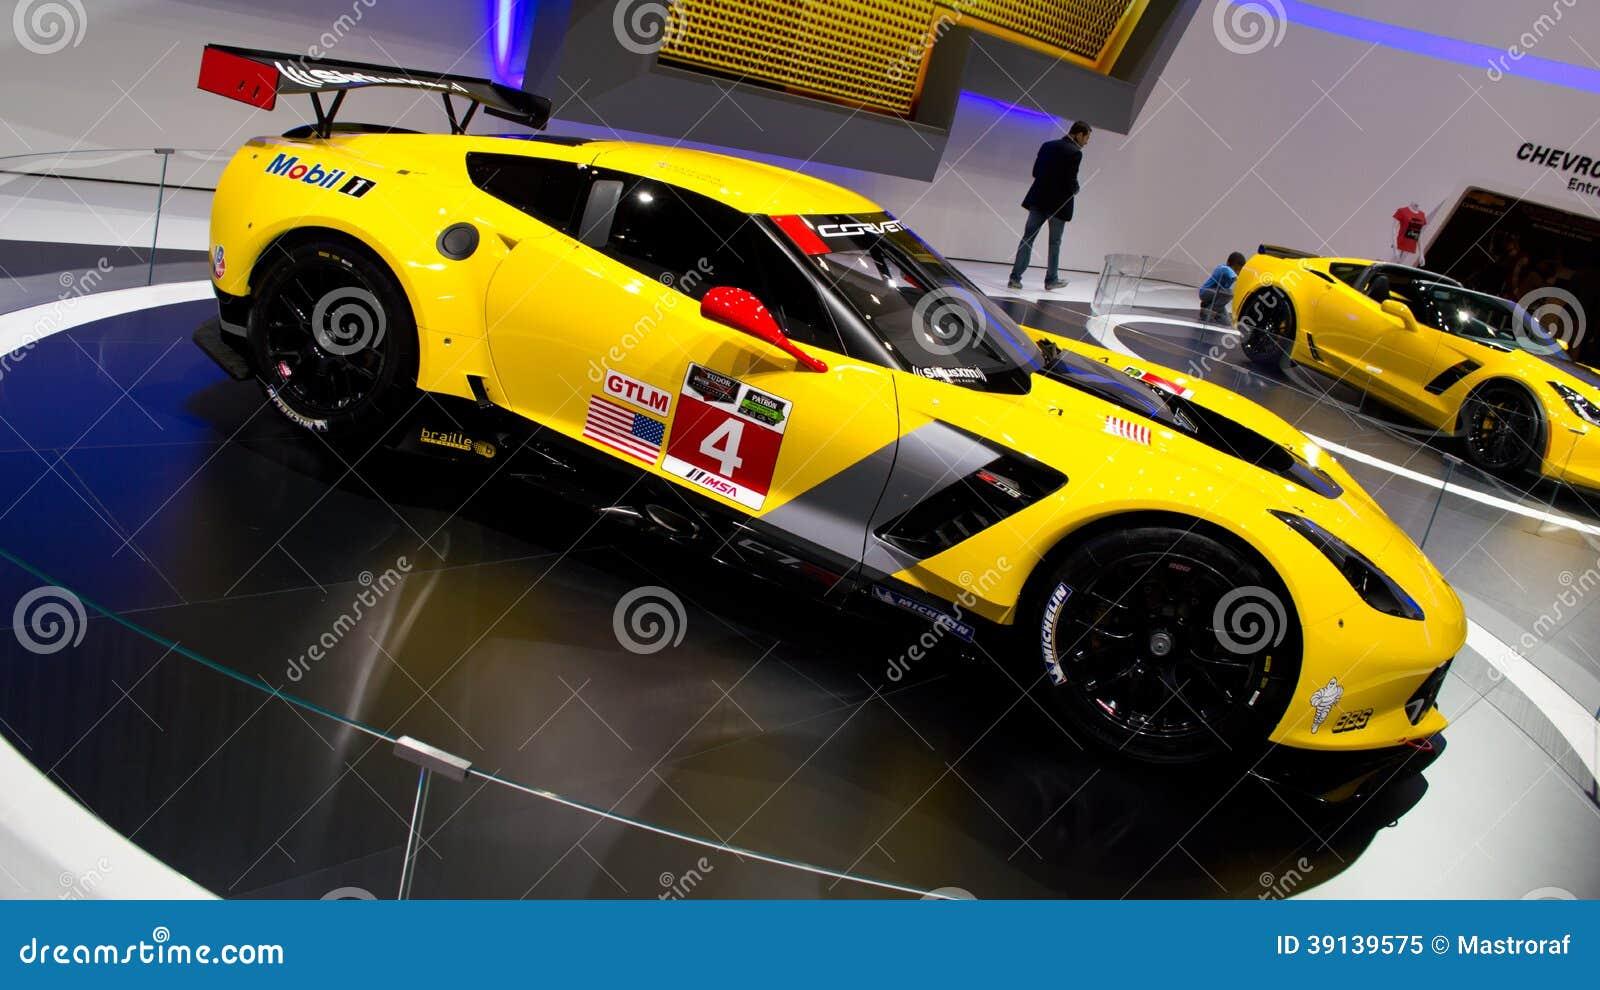 Corvette c7r geneva 2014 editorial image image 39139575 - Salon de lauto geneve ...